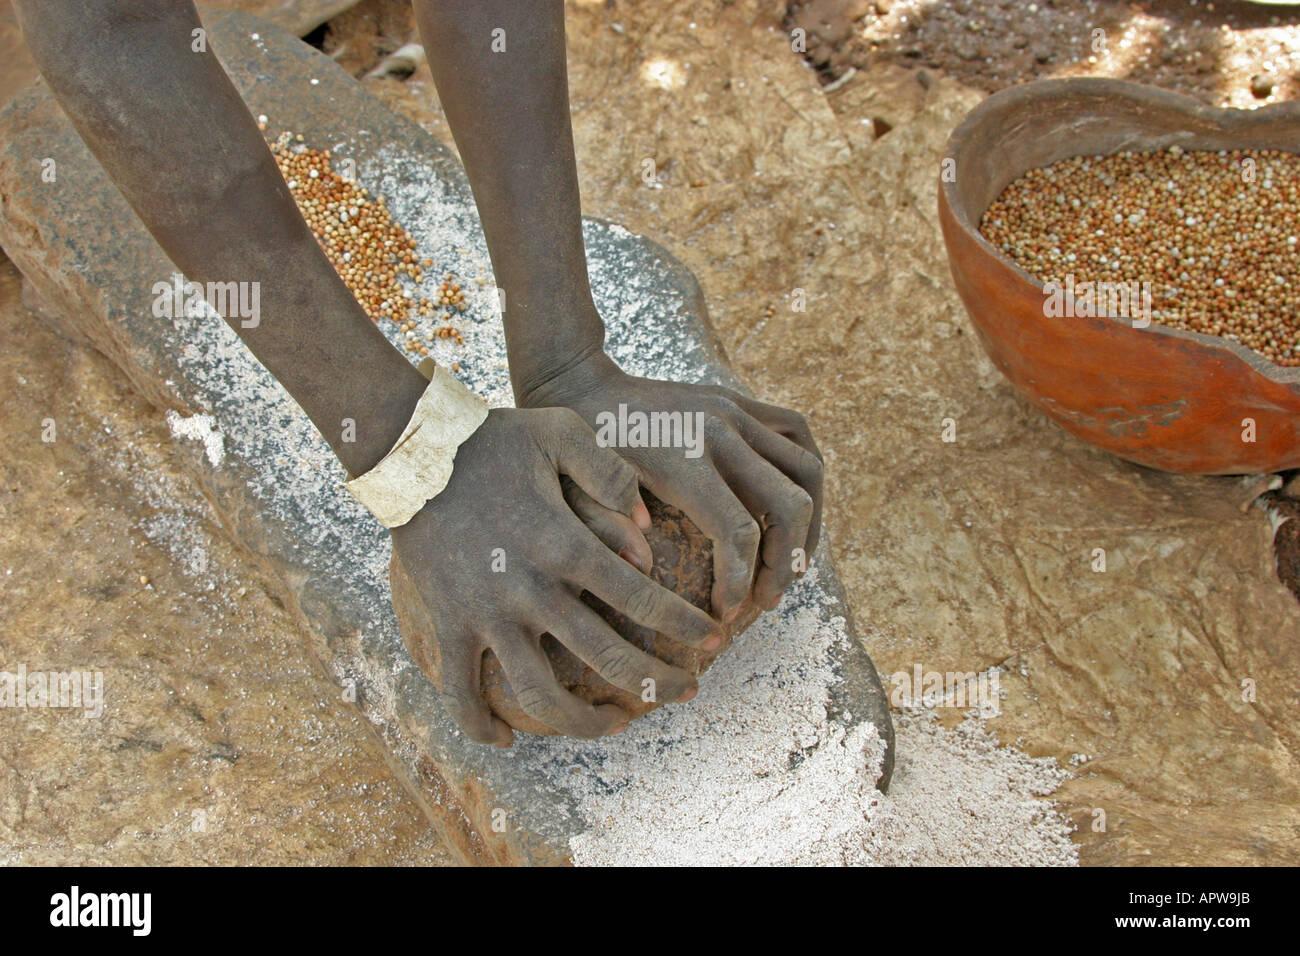 Toposa woman grinding sorghum, Sudan - Stock Image